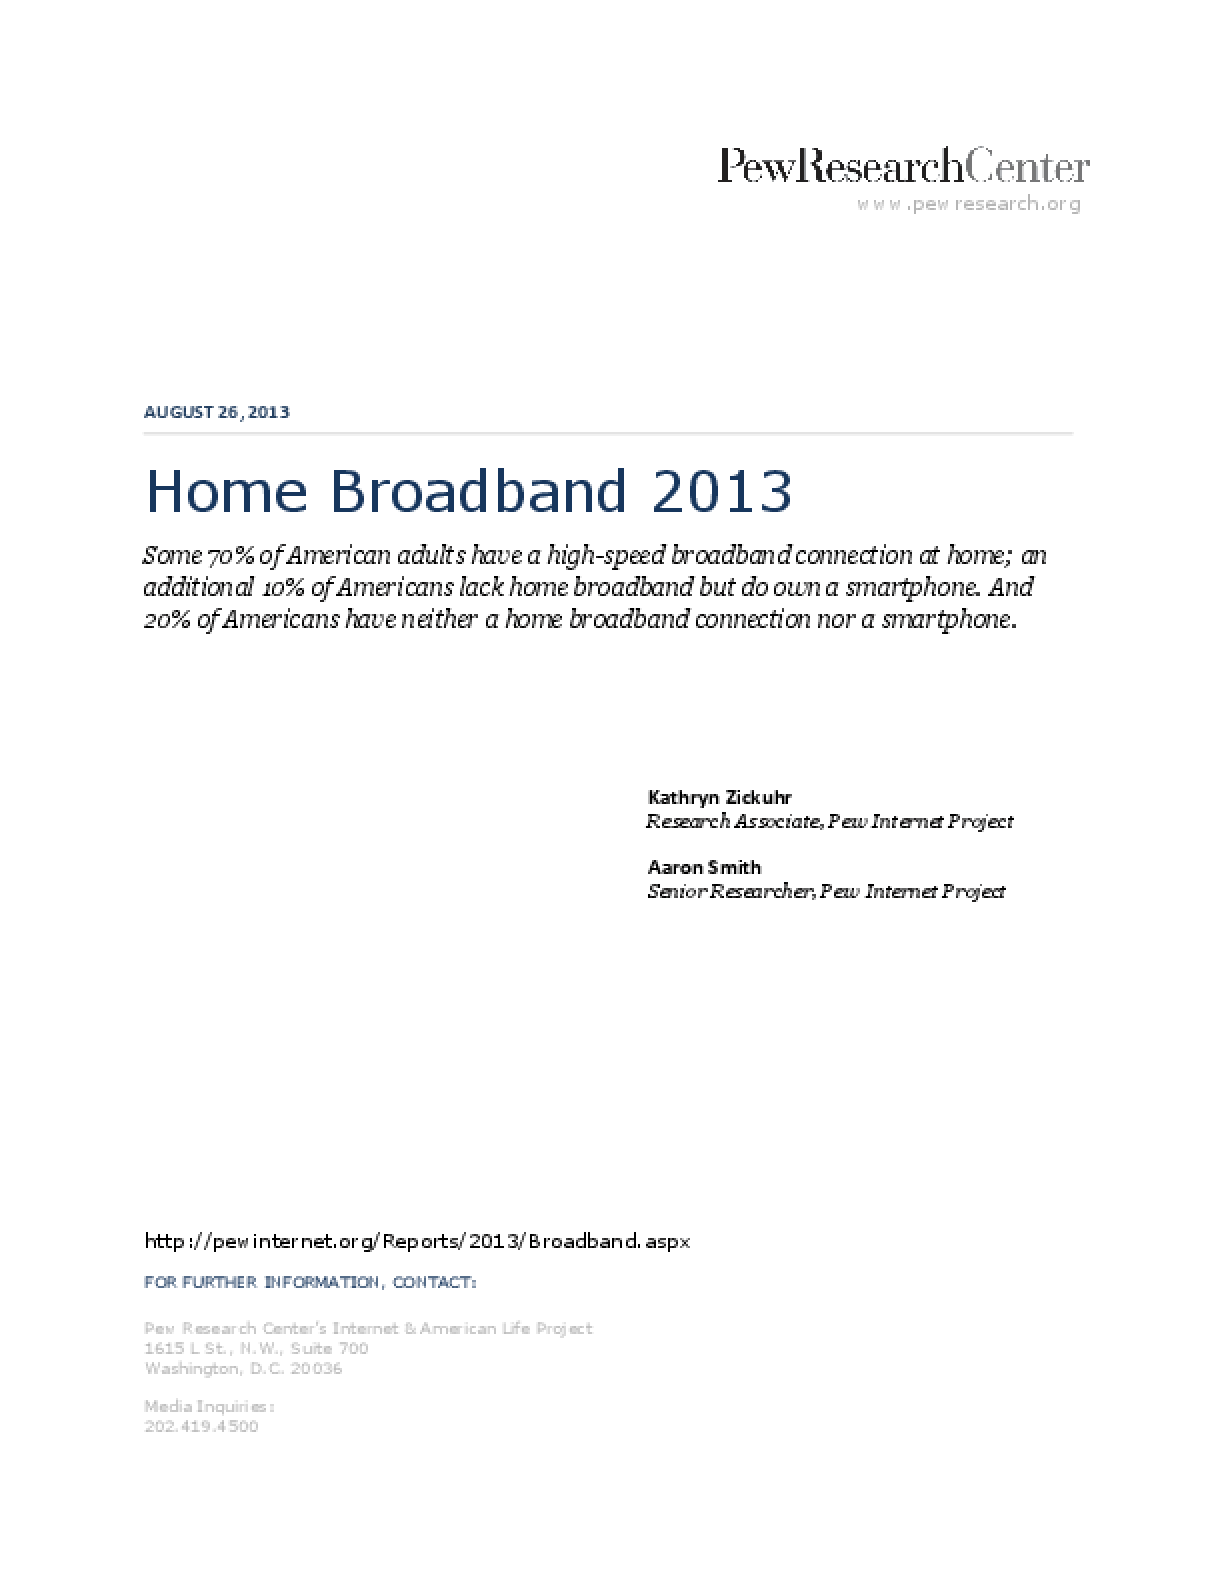 Home Broadband 2013